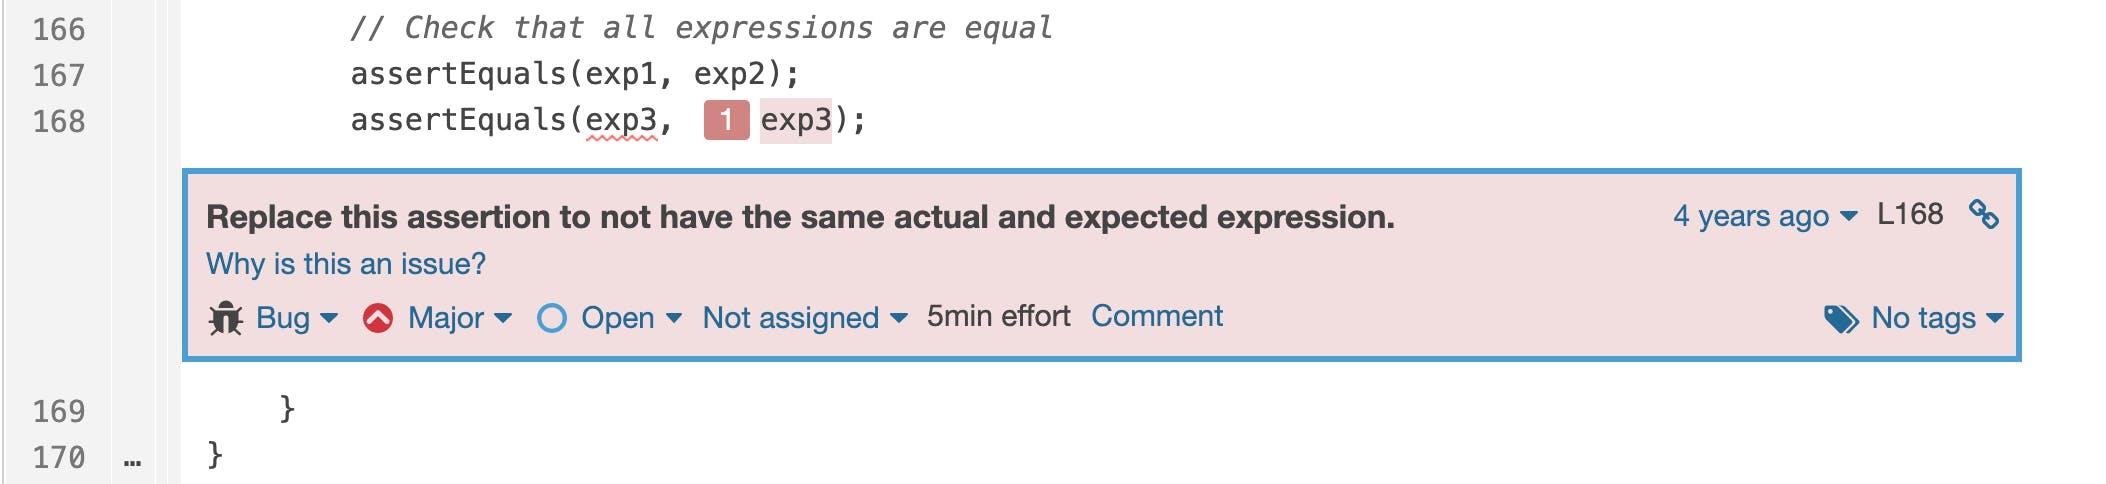 Copy/paste errors happen in tests too: `assertEquals(exp3, exp3);`